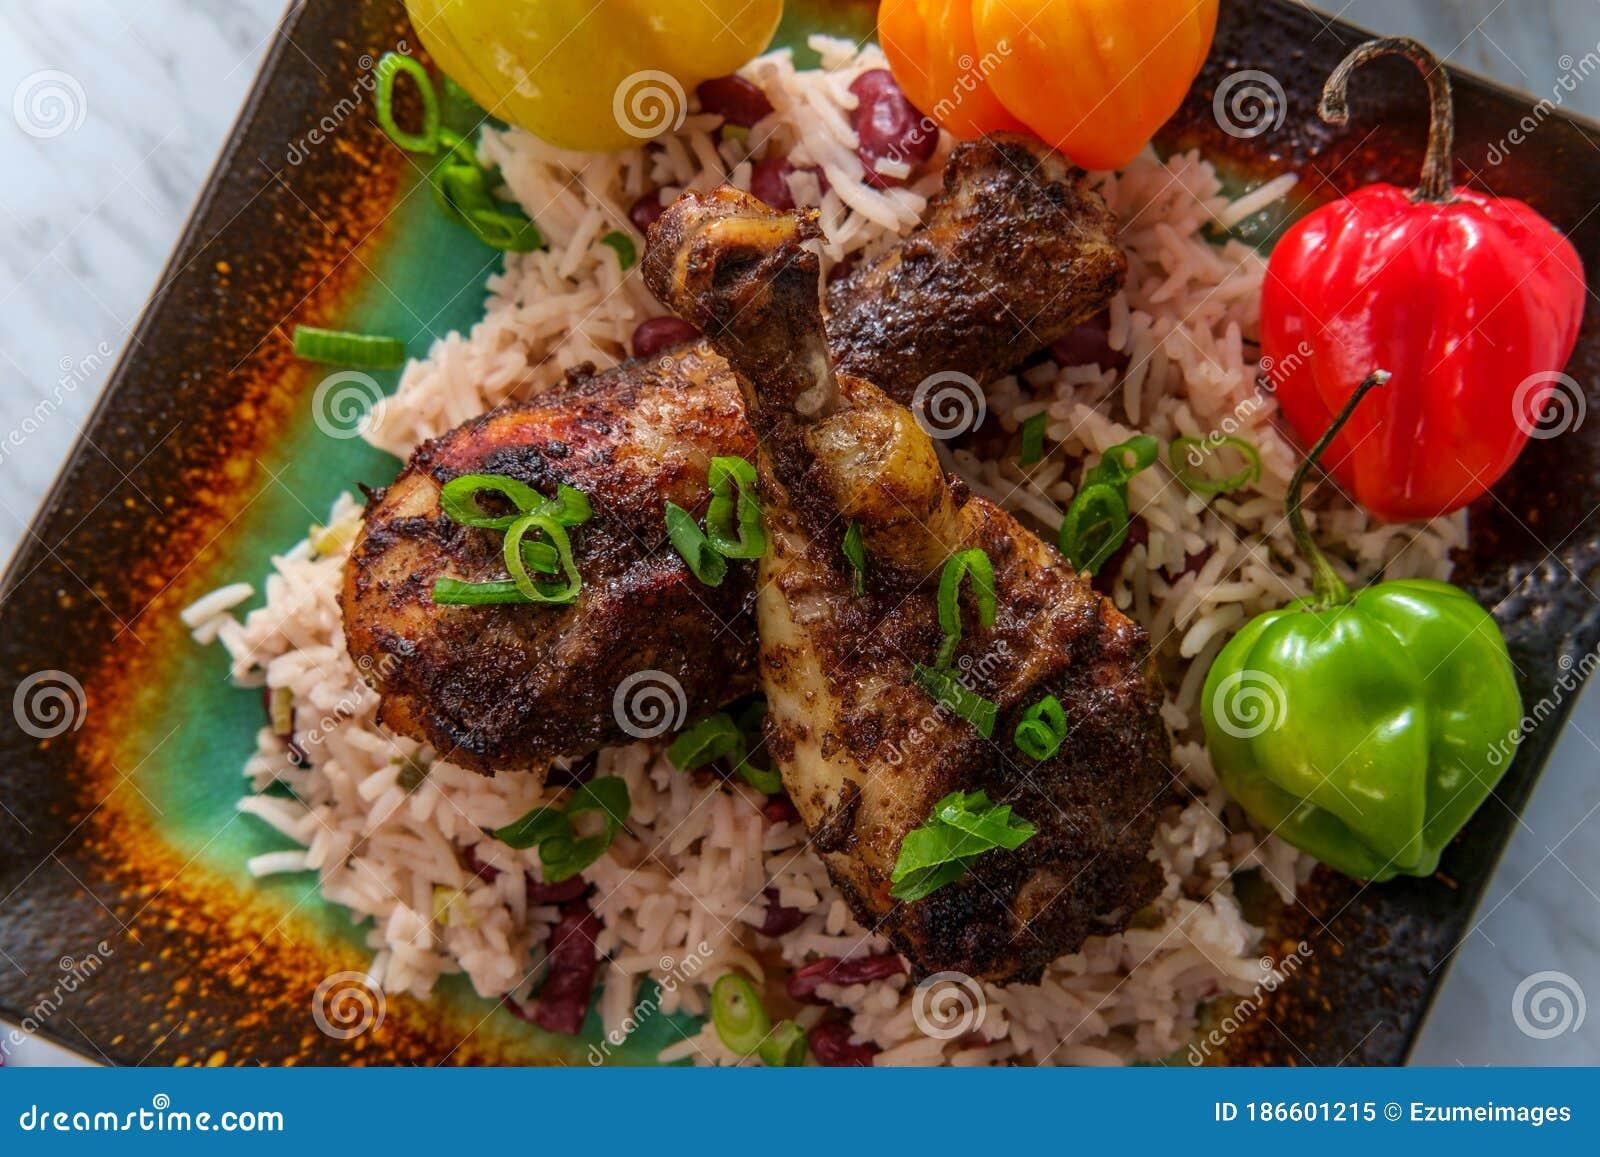 Jamaican Jerk Chicken Legs Stock Image Image Of Kitchen 186601215